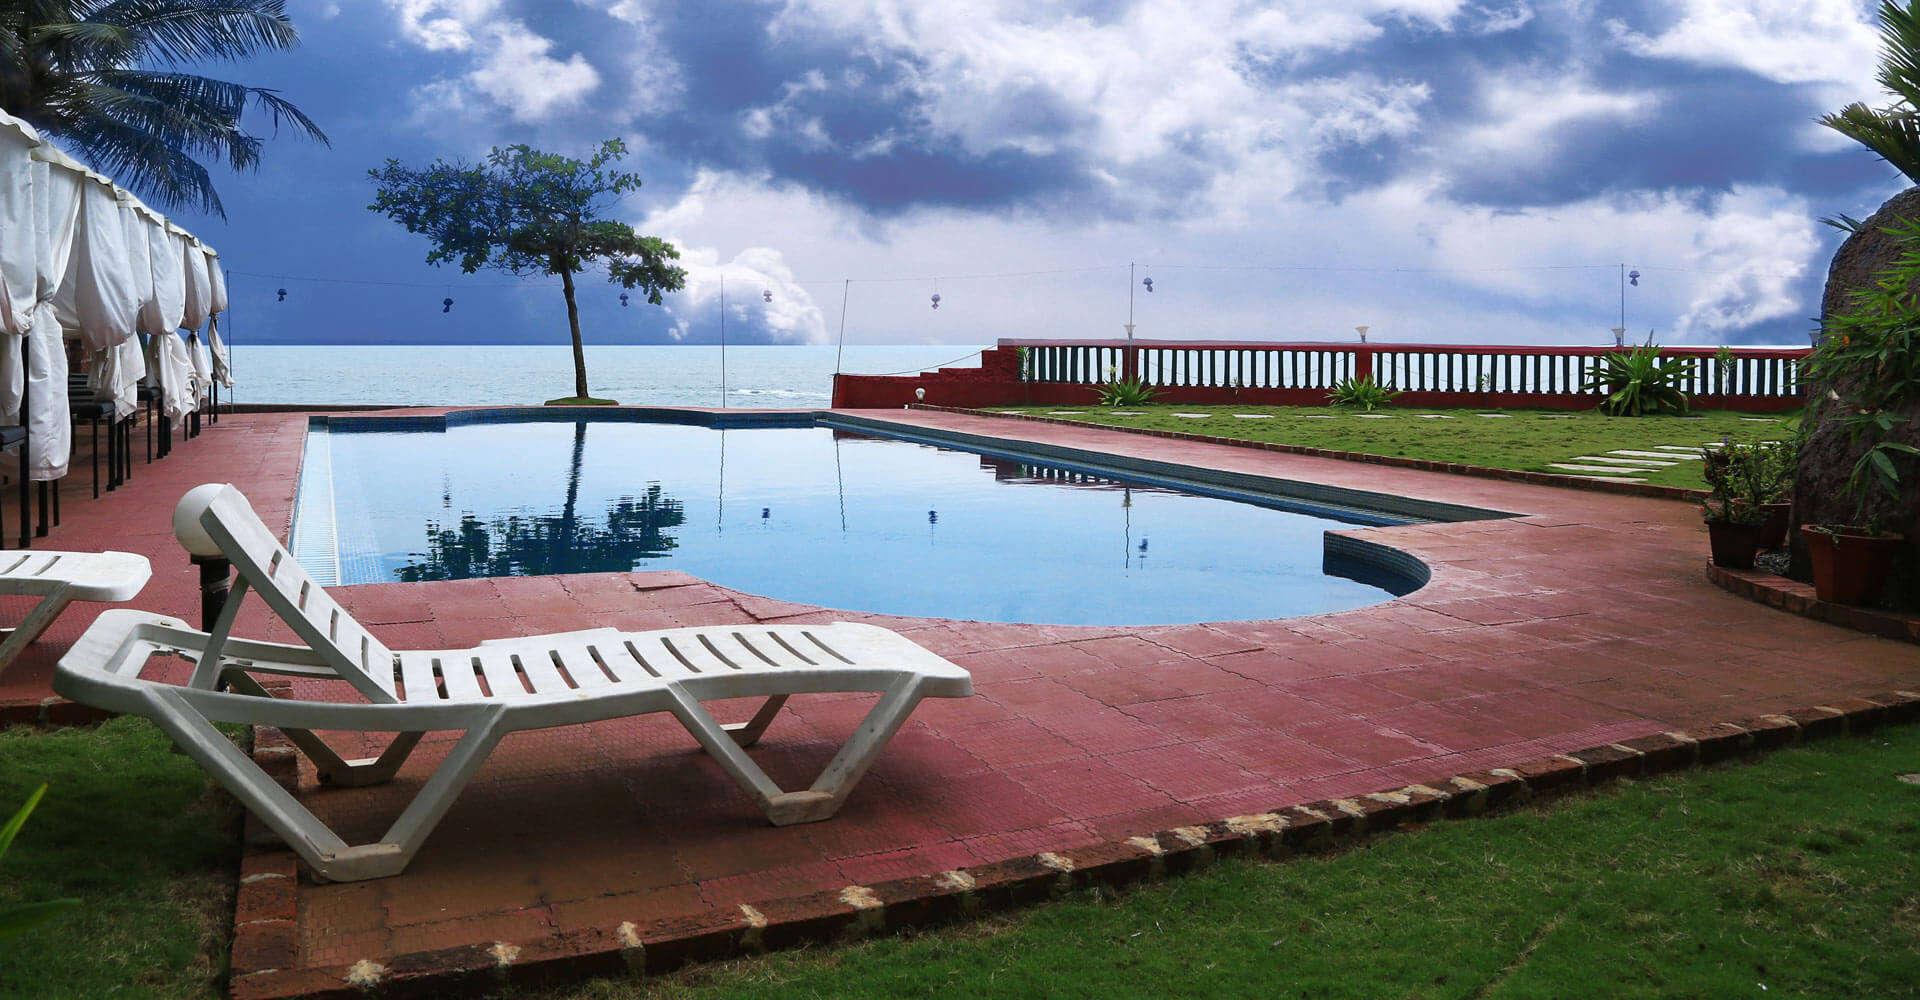 Mascot Beach Resort in Kerala